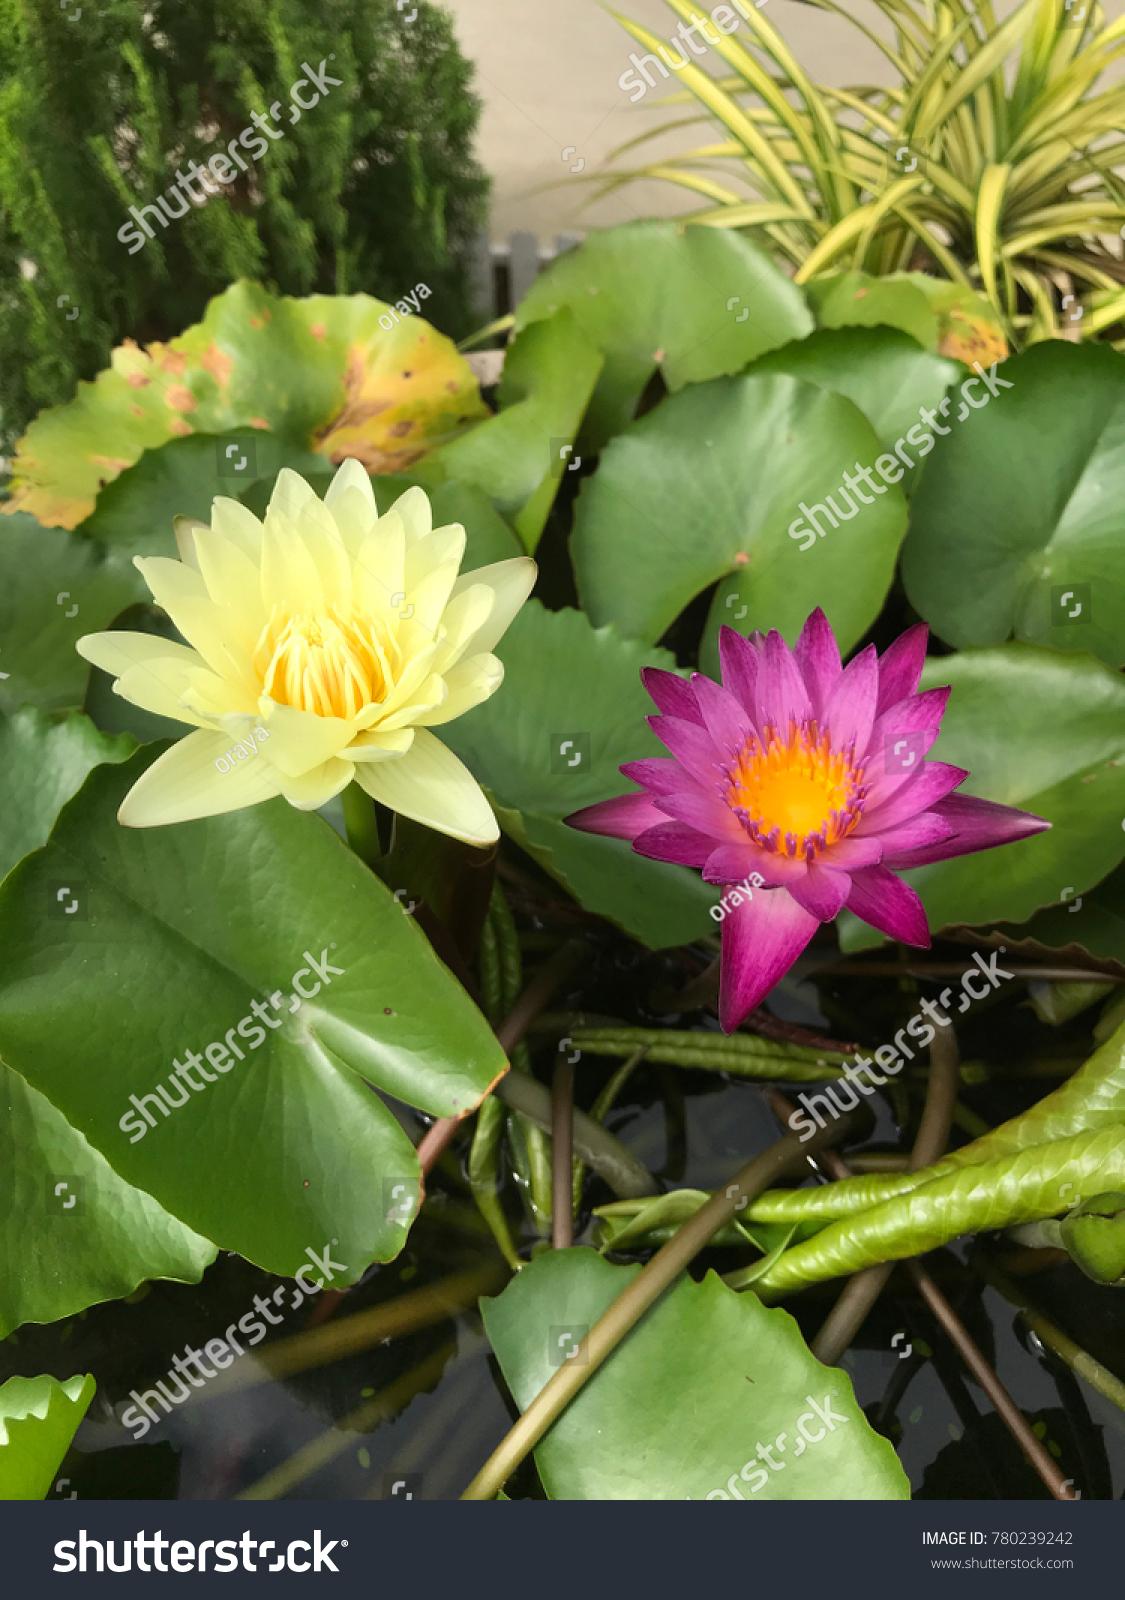 Lotus flower in the garden background ez canvas id 780239242 izmirmasajfo